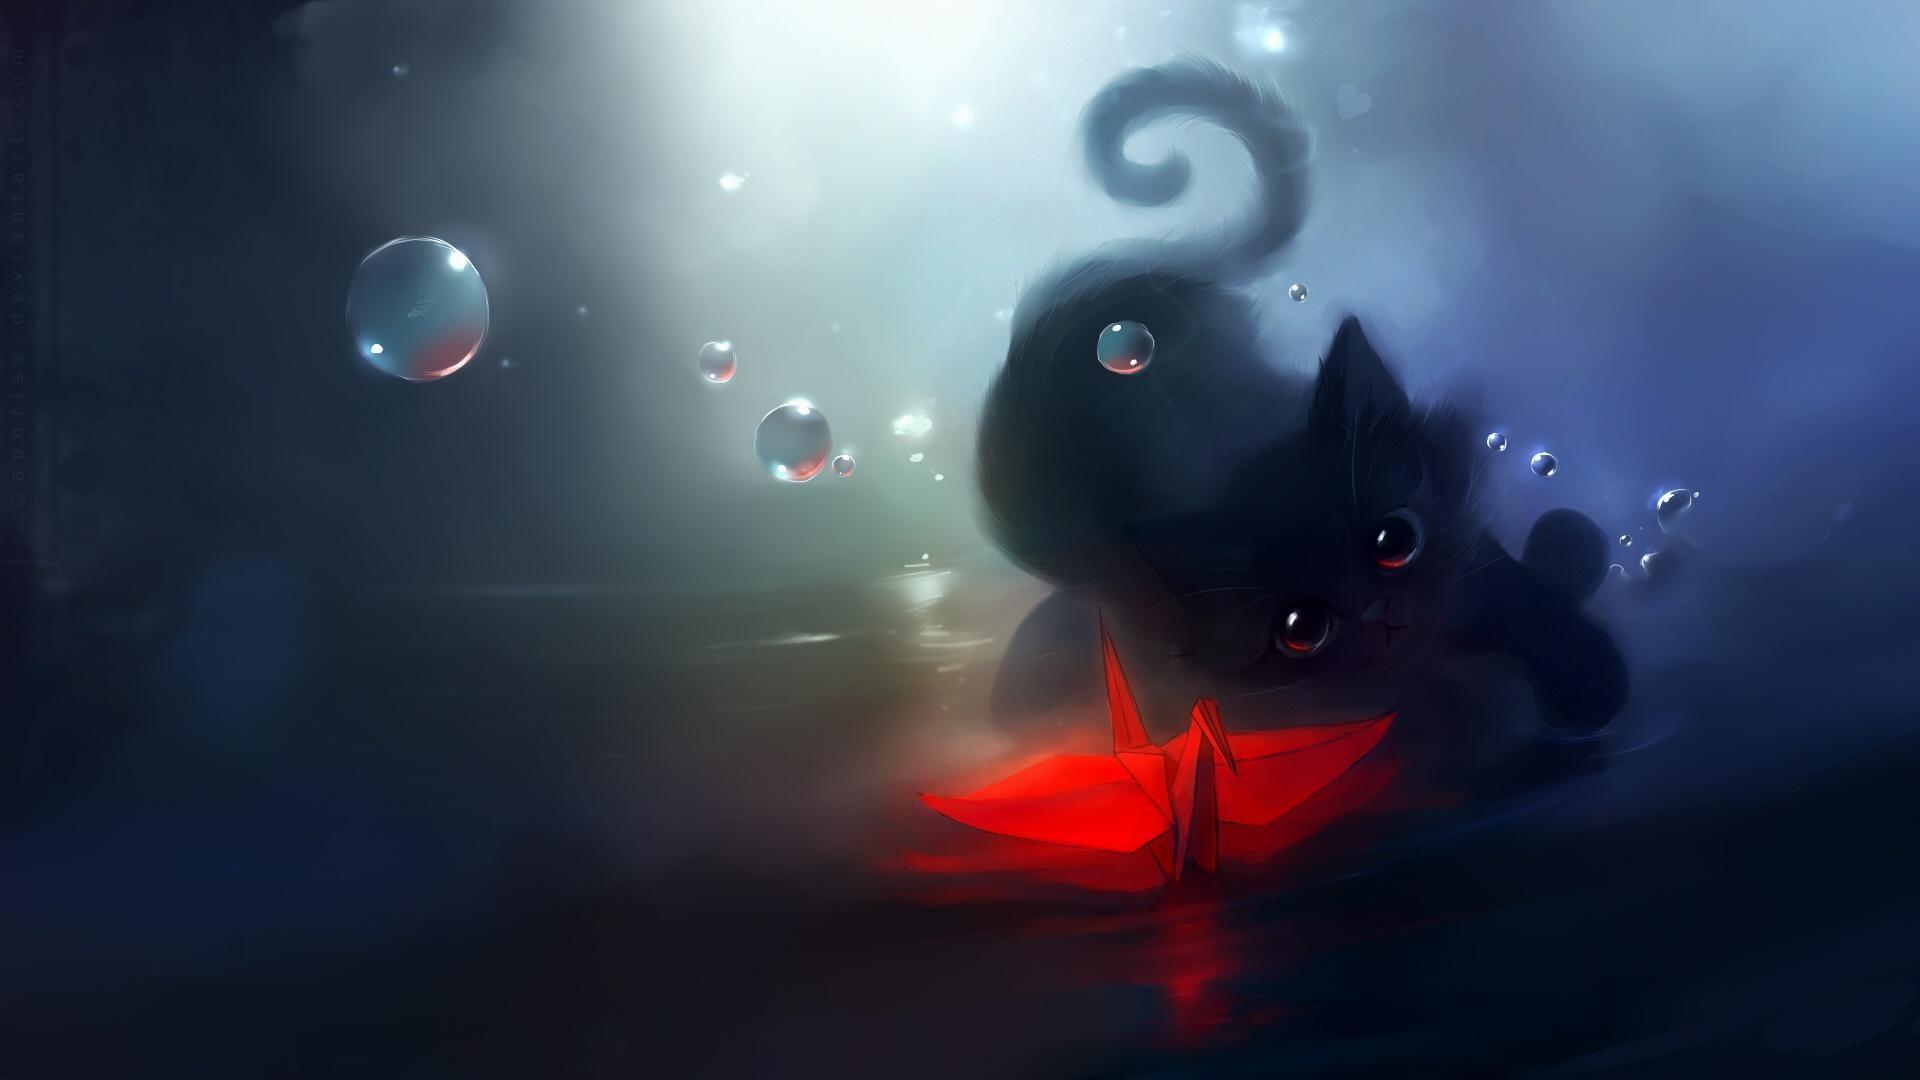 wallpaper.wiki-HD-Cartoon-Cat-Background-PIC-WPE0011401